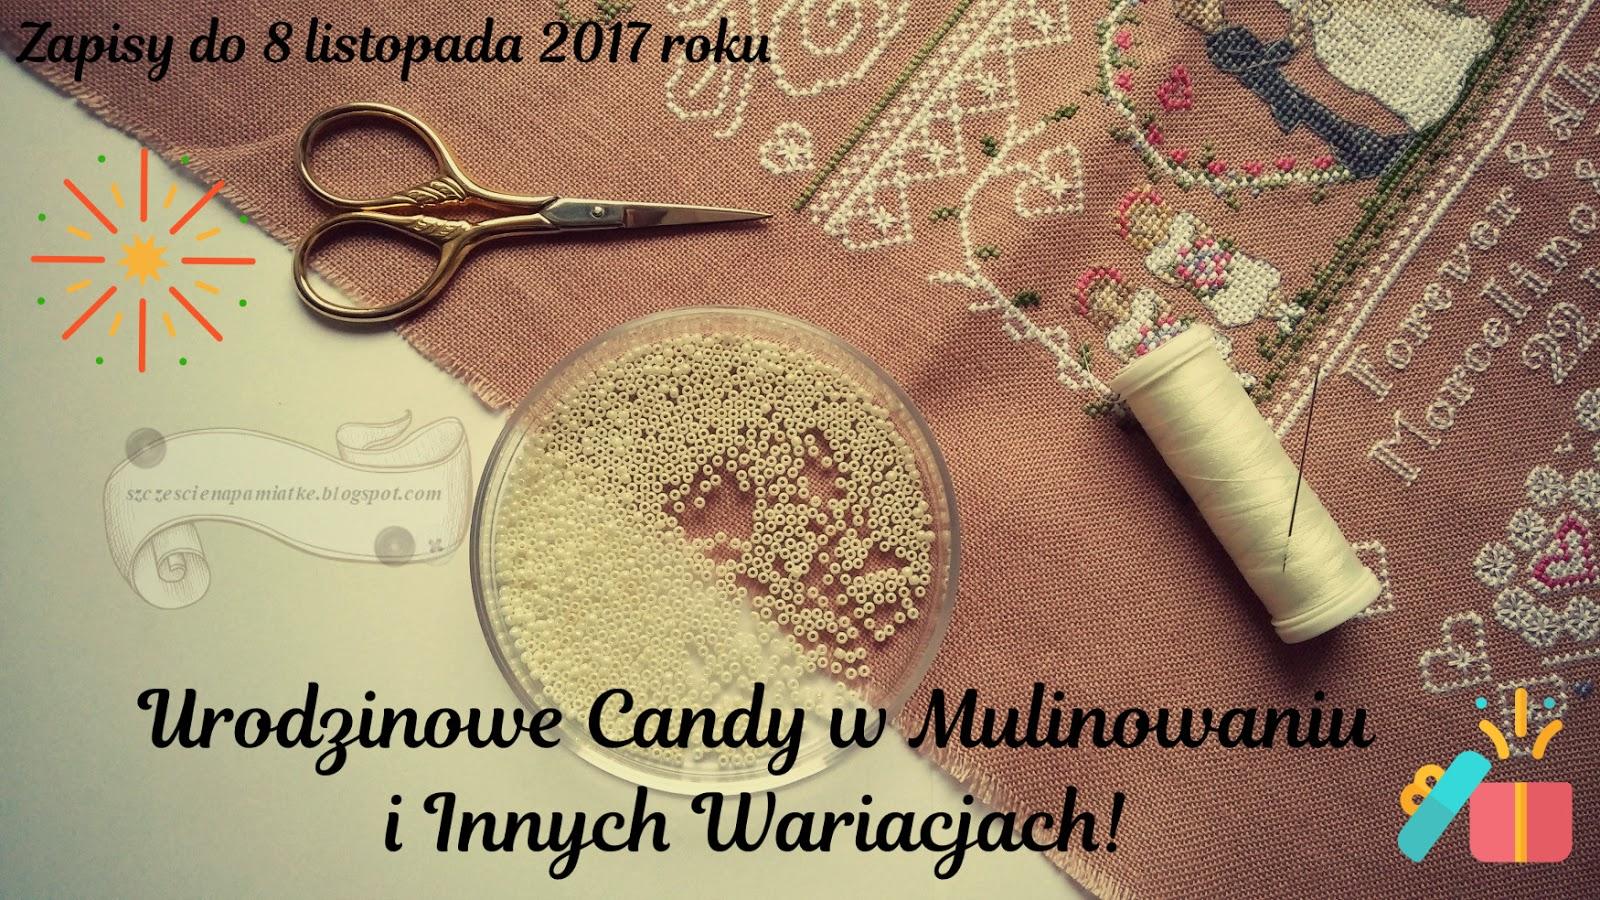 Candy u Ewy:)